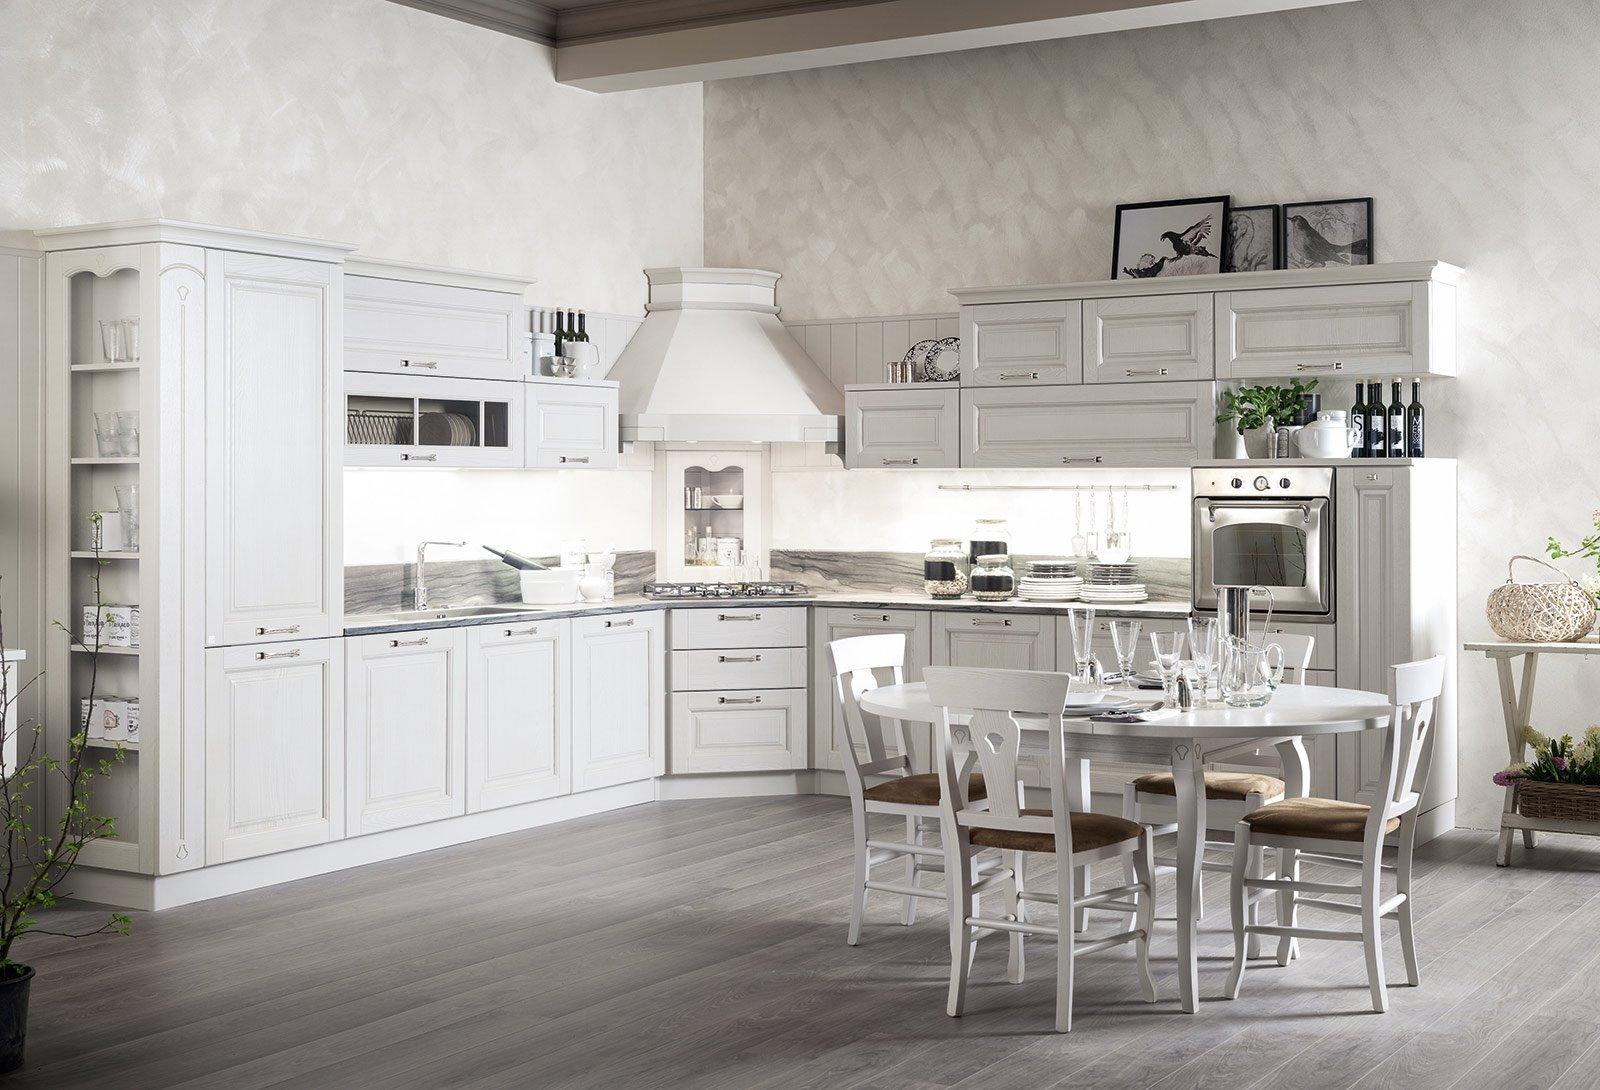 La nuova cucina country new classic cose di casa - Cucina country bianca ...